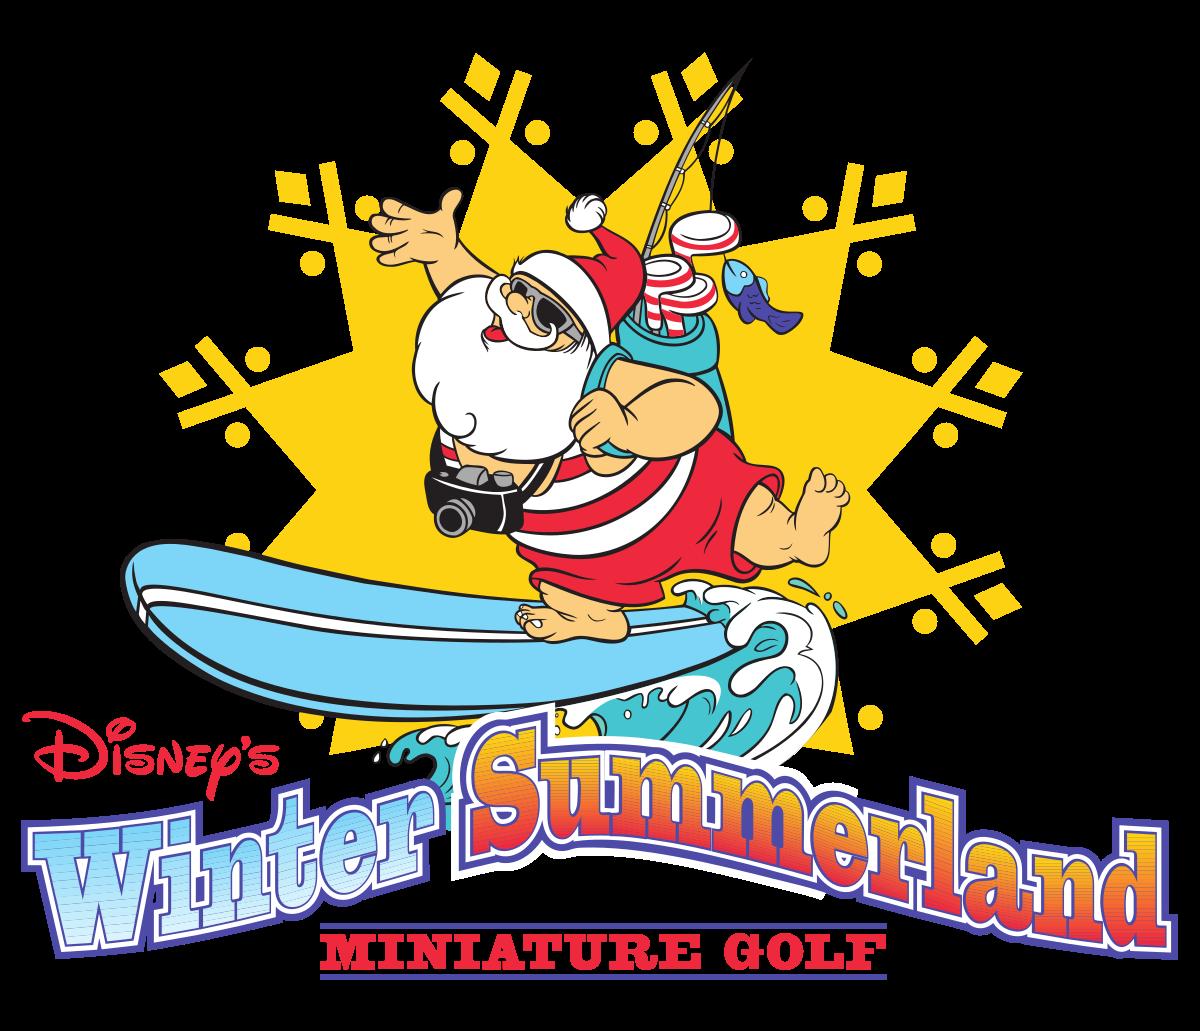 Winter summerland wikipedia . Club clipart miniature golf